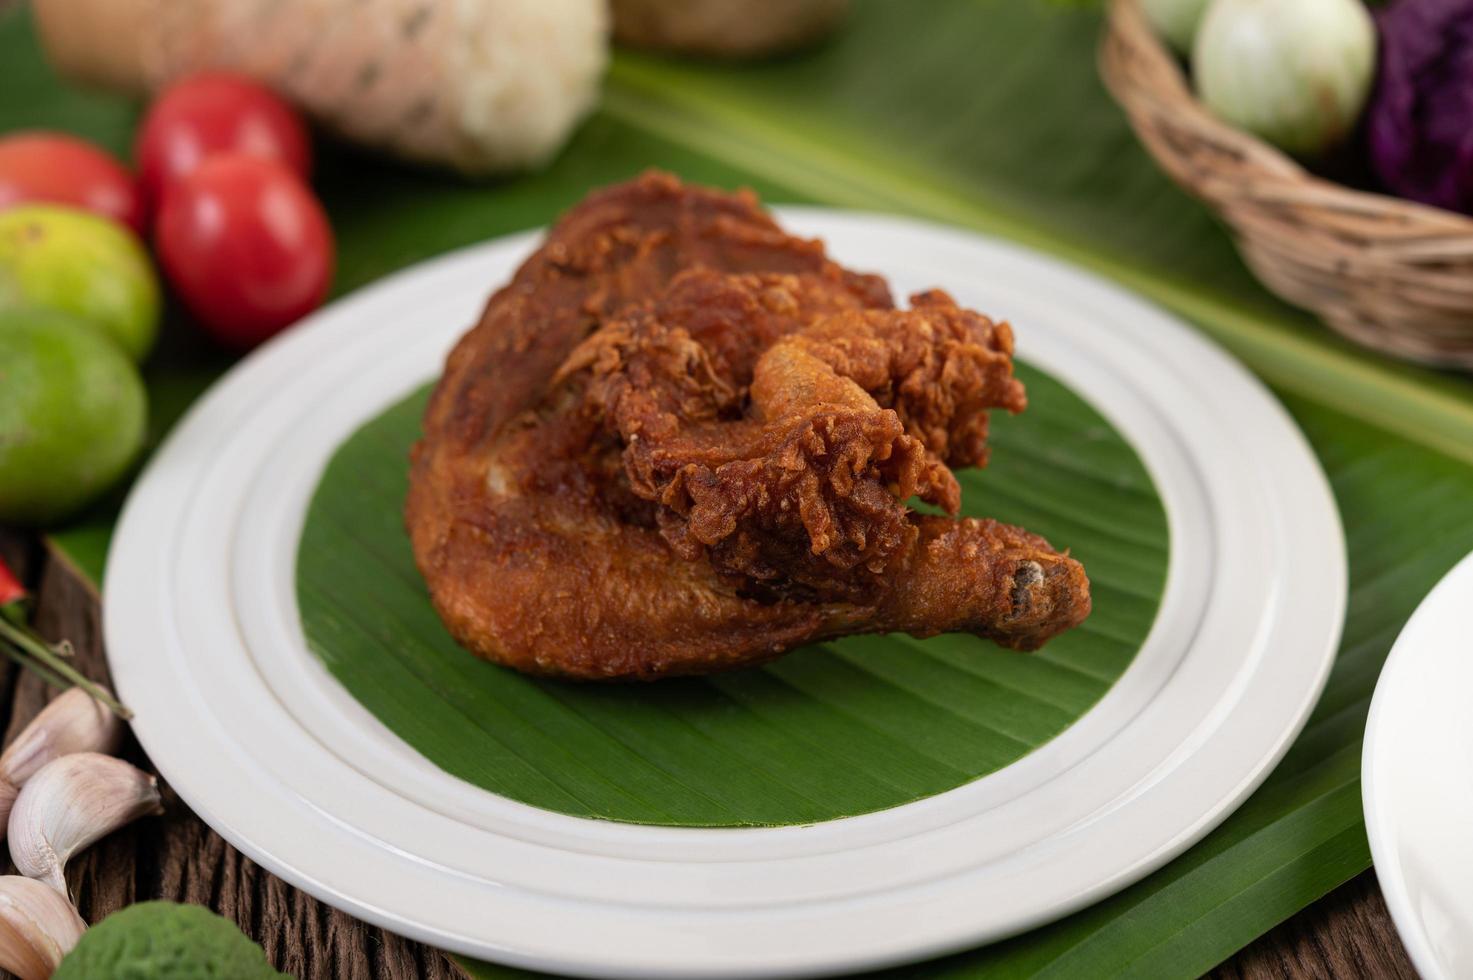 gebakken kippendijen foto